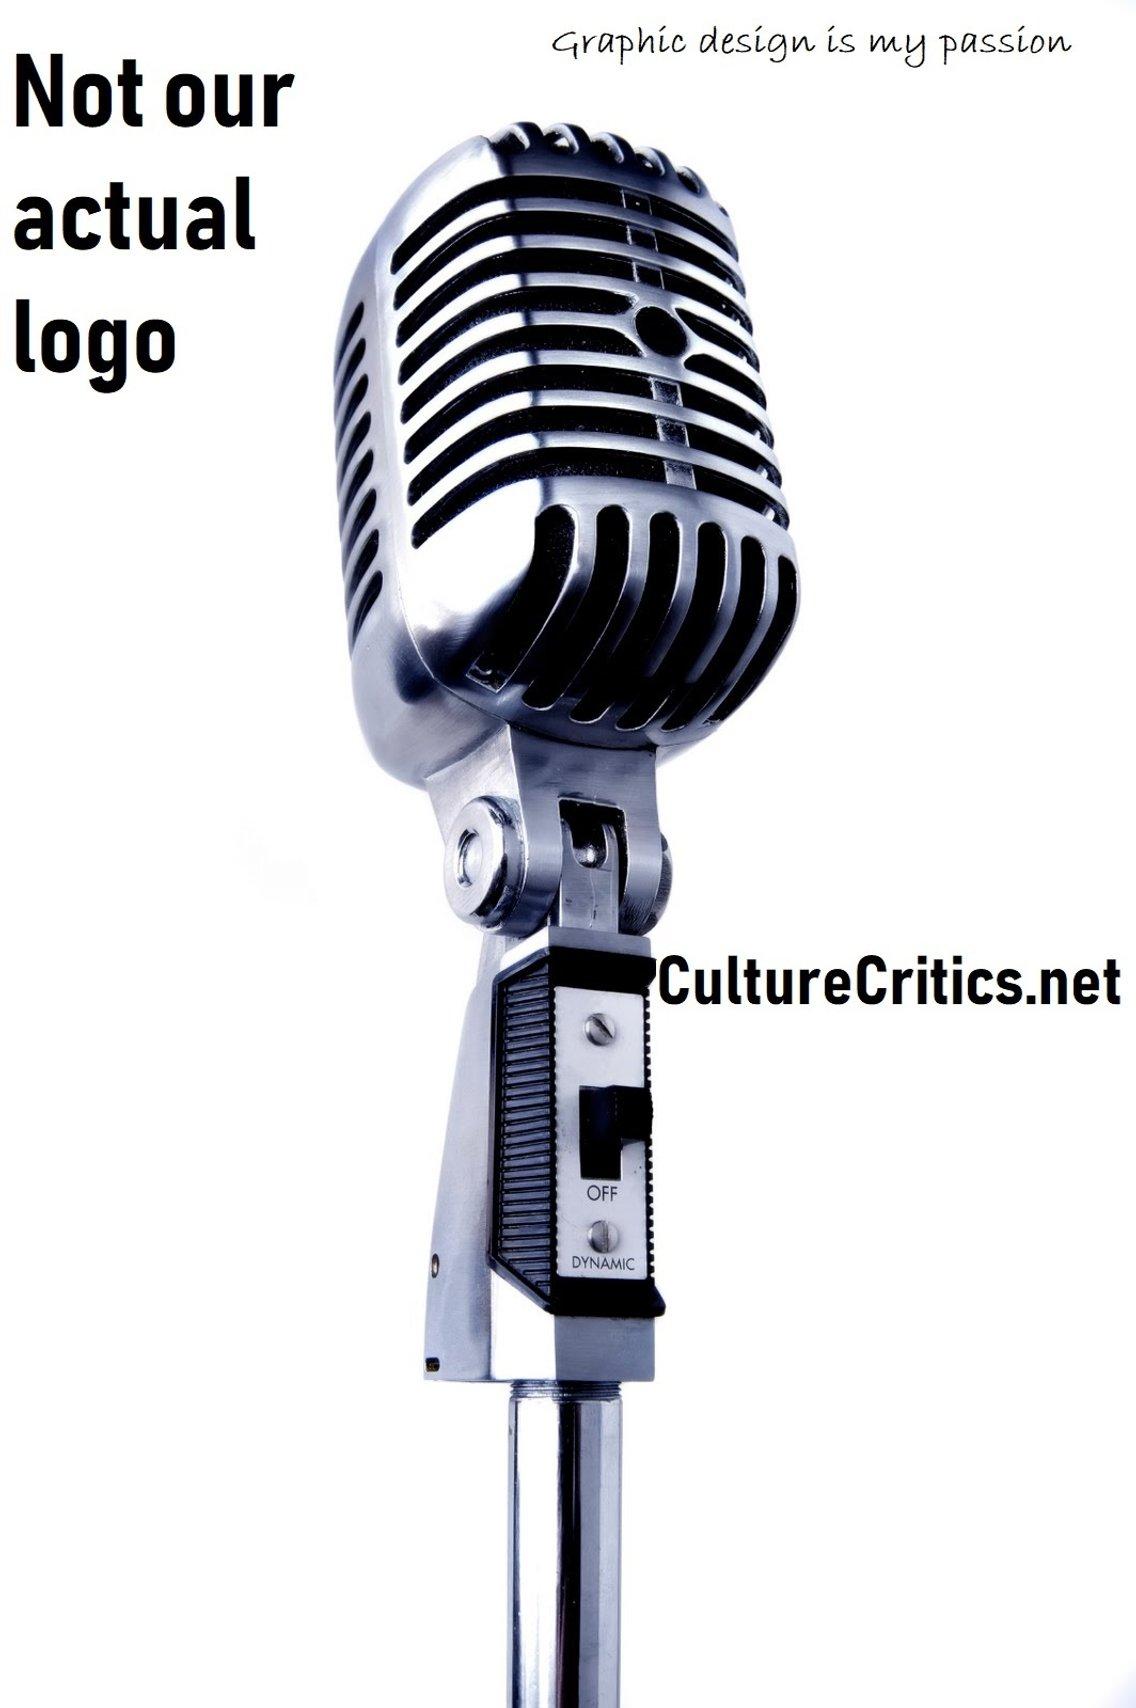 Culture Critics - Cover Image